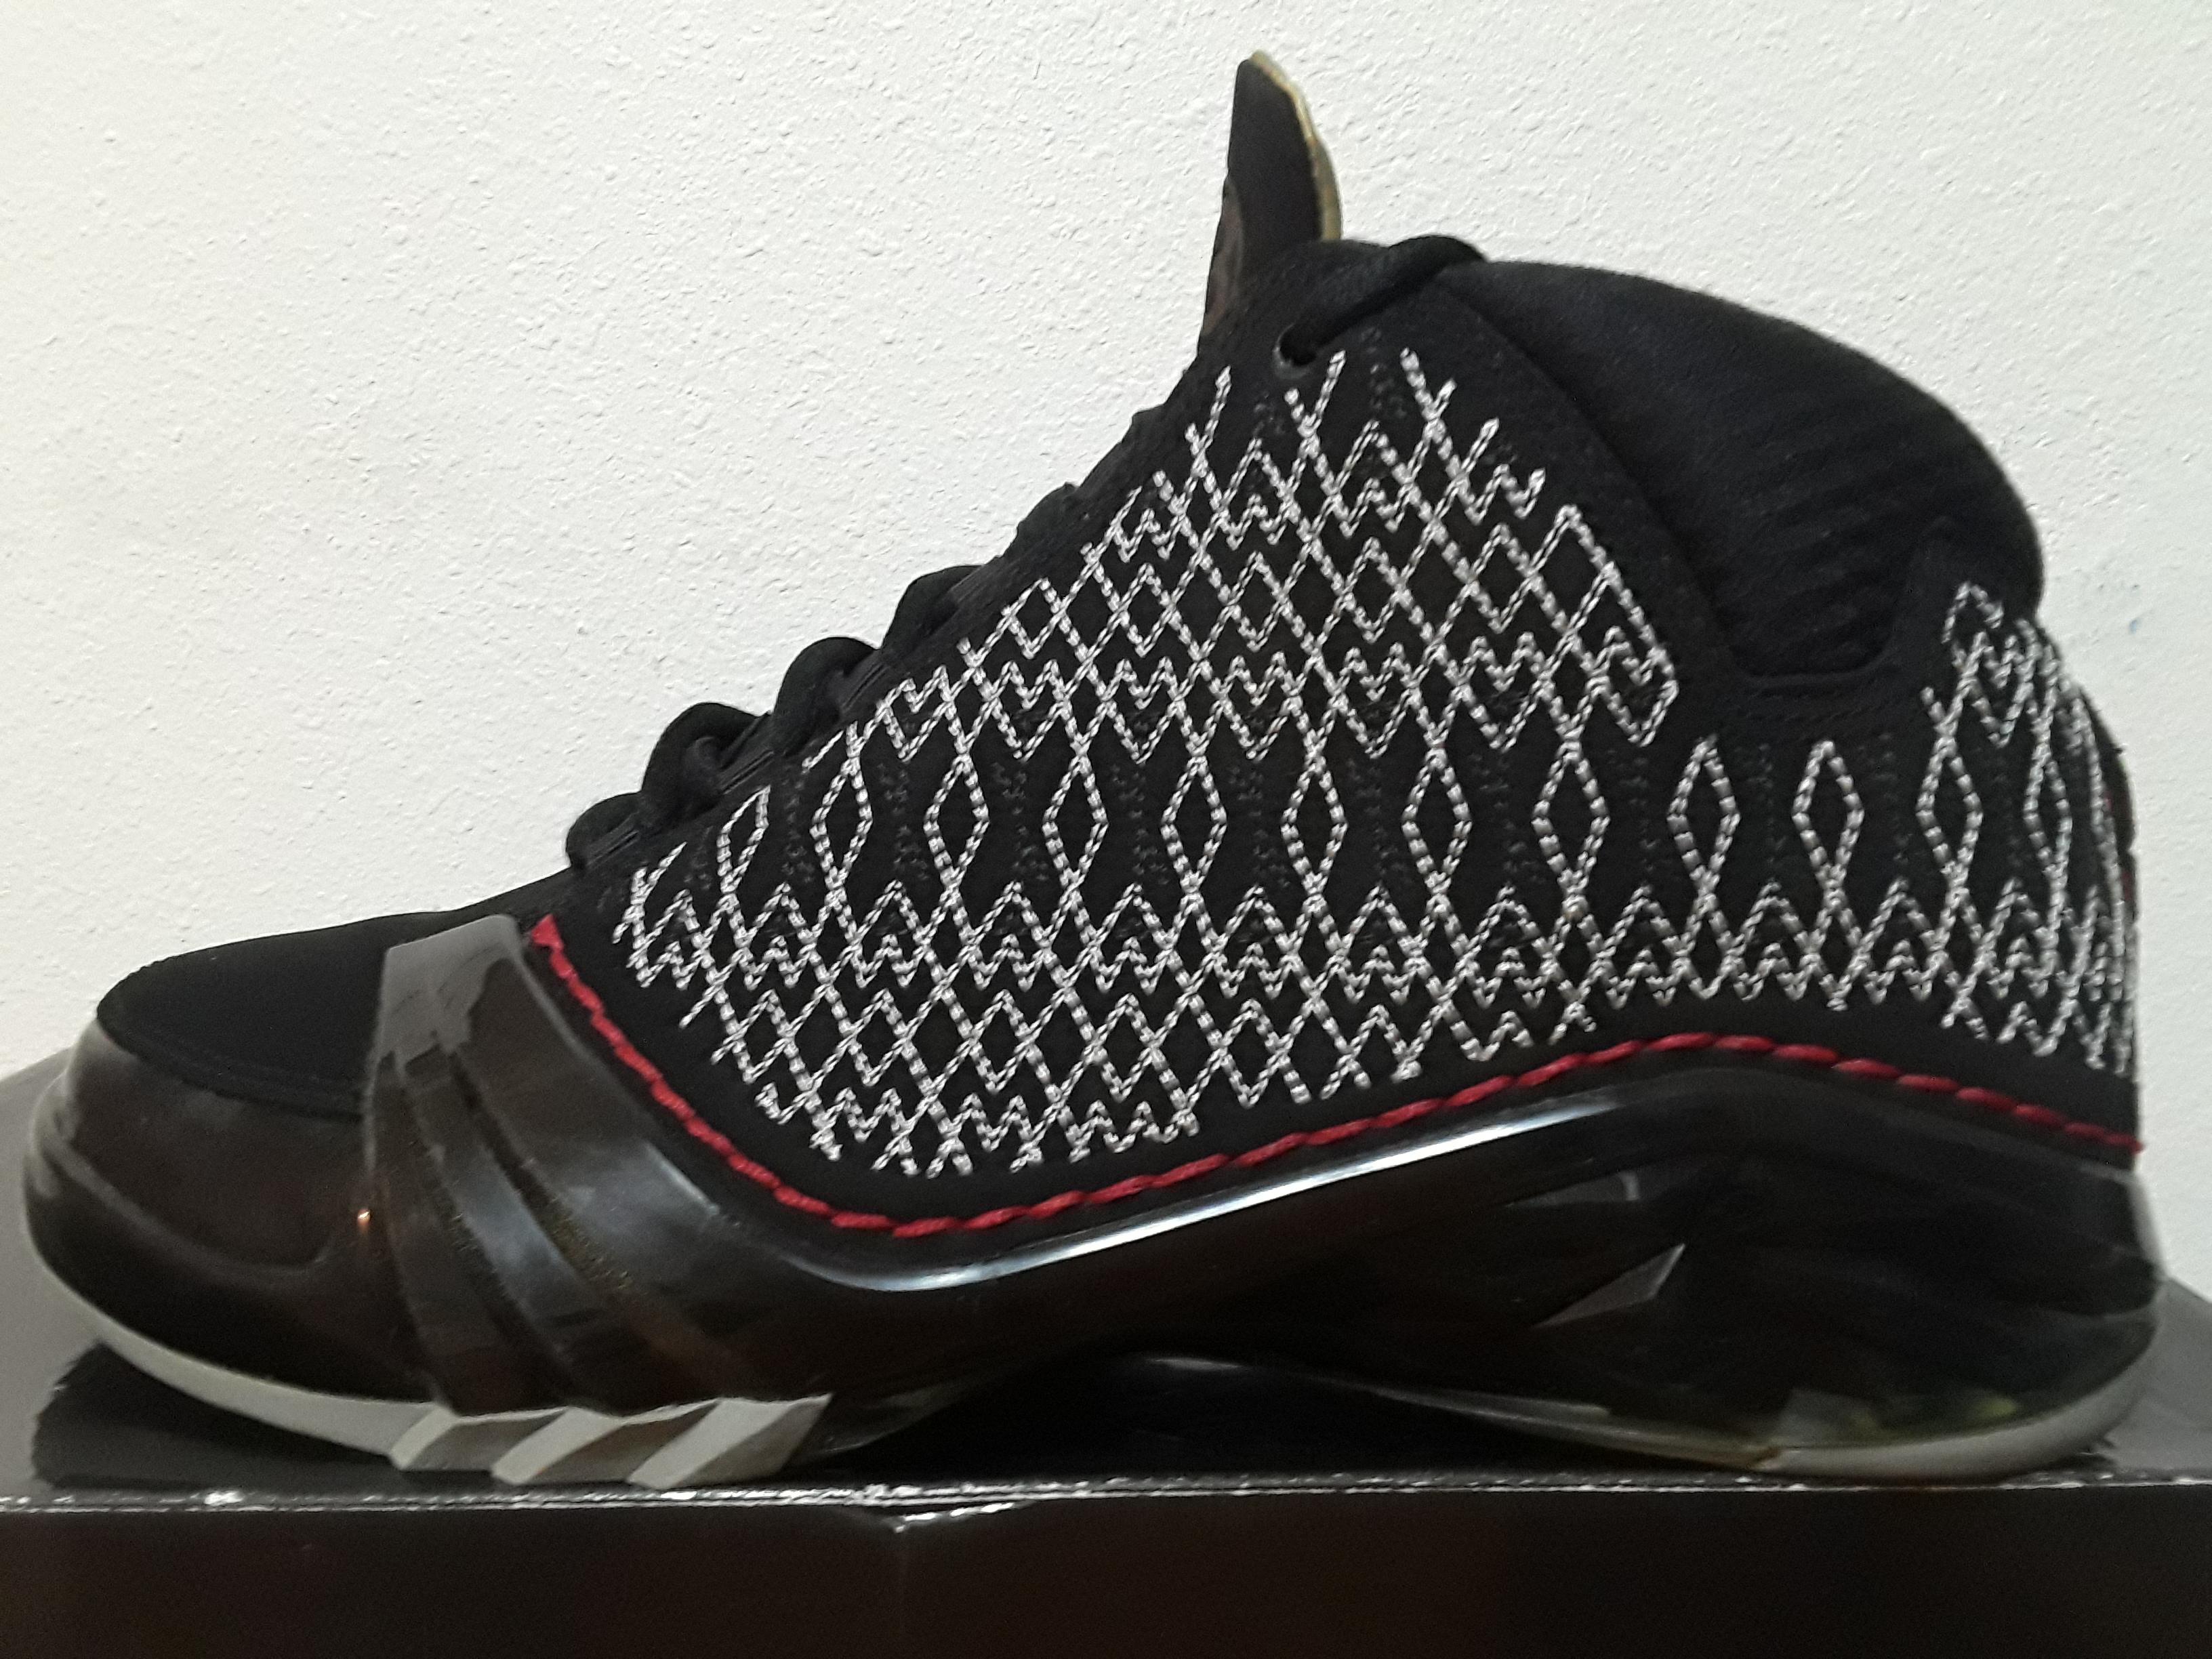 c997d3eeec5 Nike Air Jordan Xx3 (23) Gs | Grailed